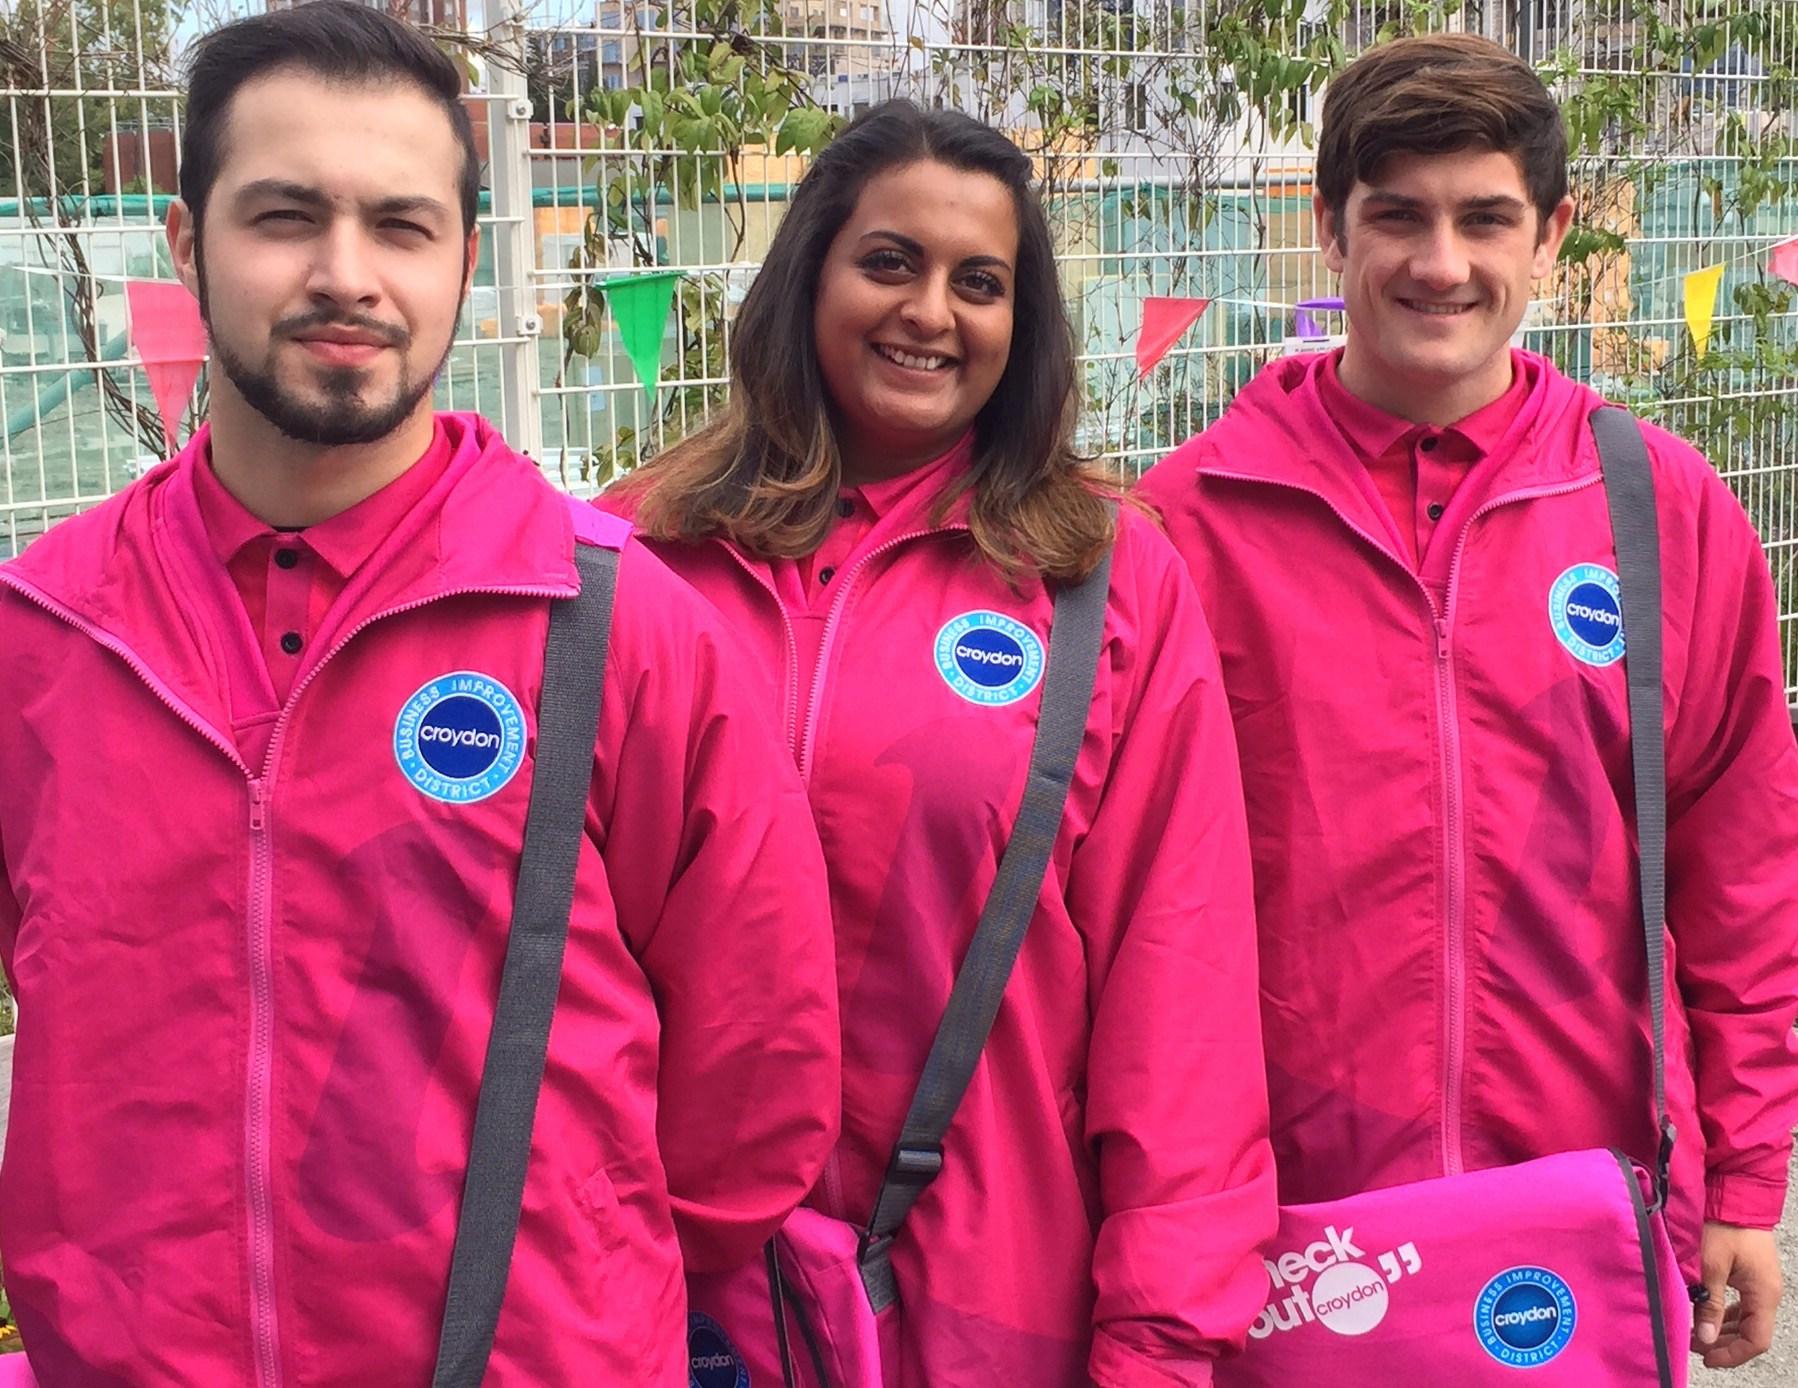 croydon_team.jpg